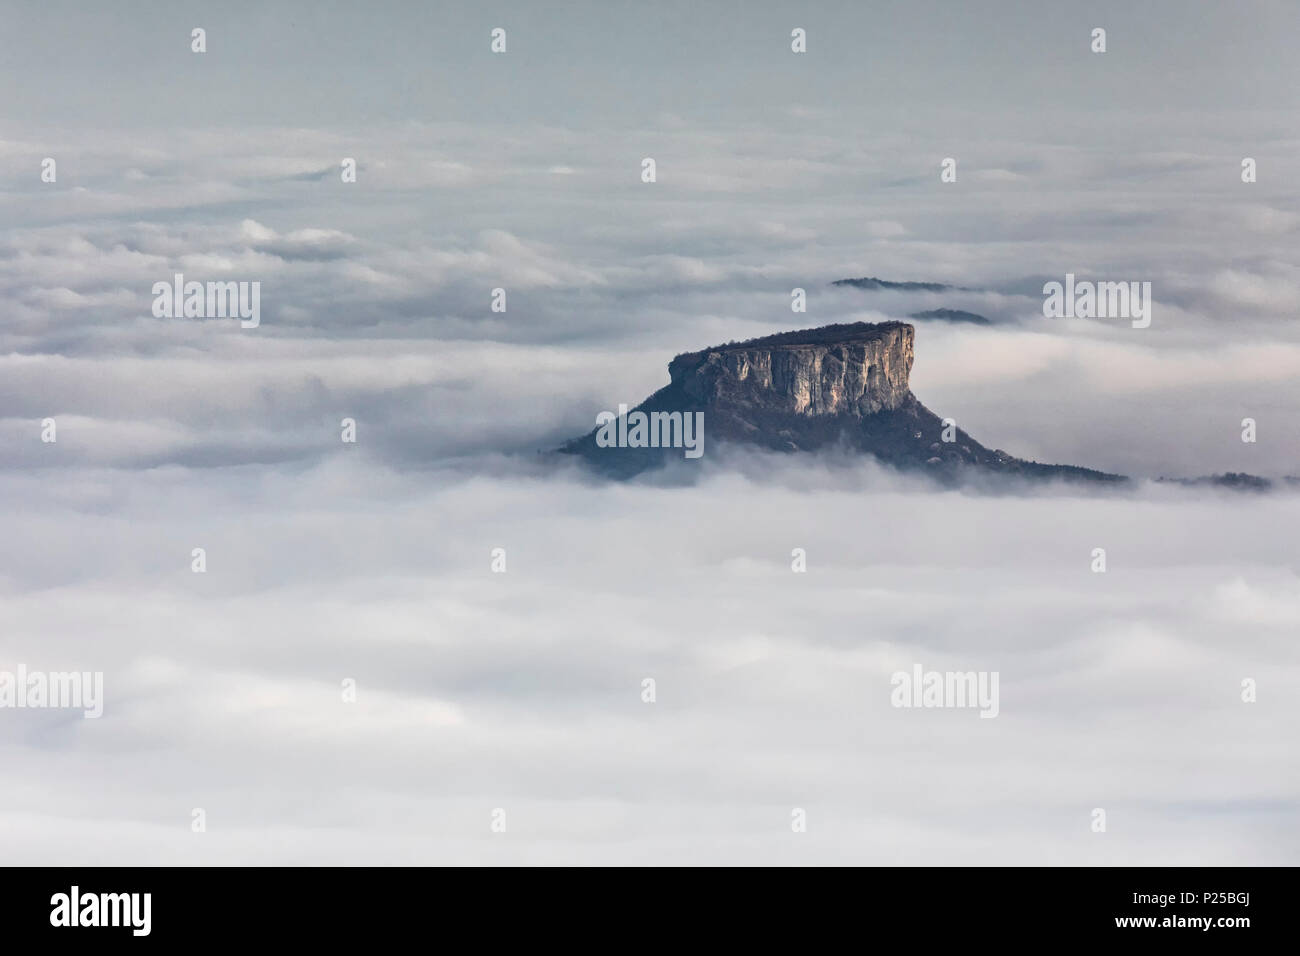 the bismantova stone emerges from the fog, Reggio Emilia province, Emilia Romagna district, Italy, Europe - Stock Image